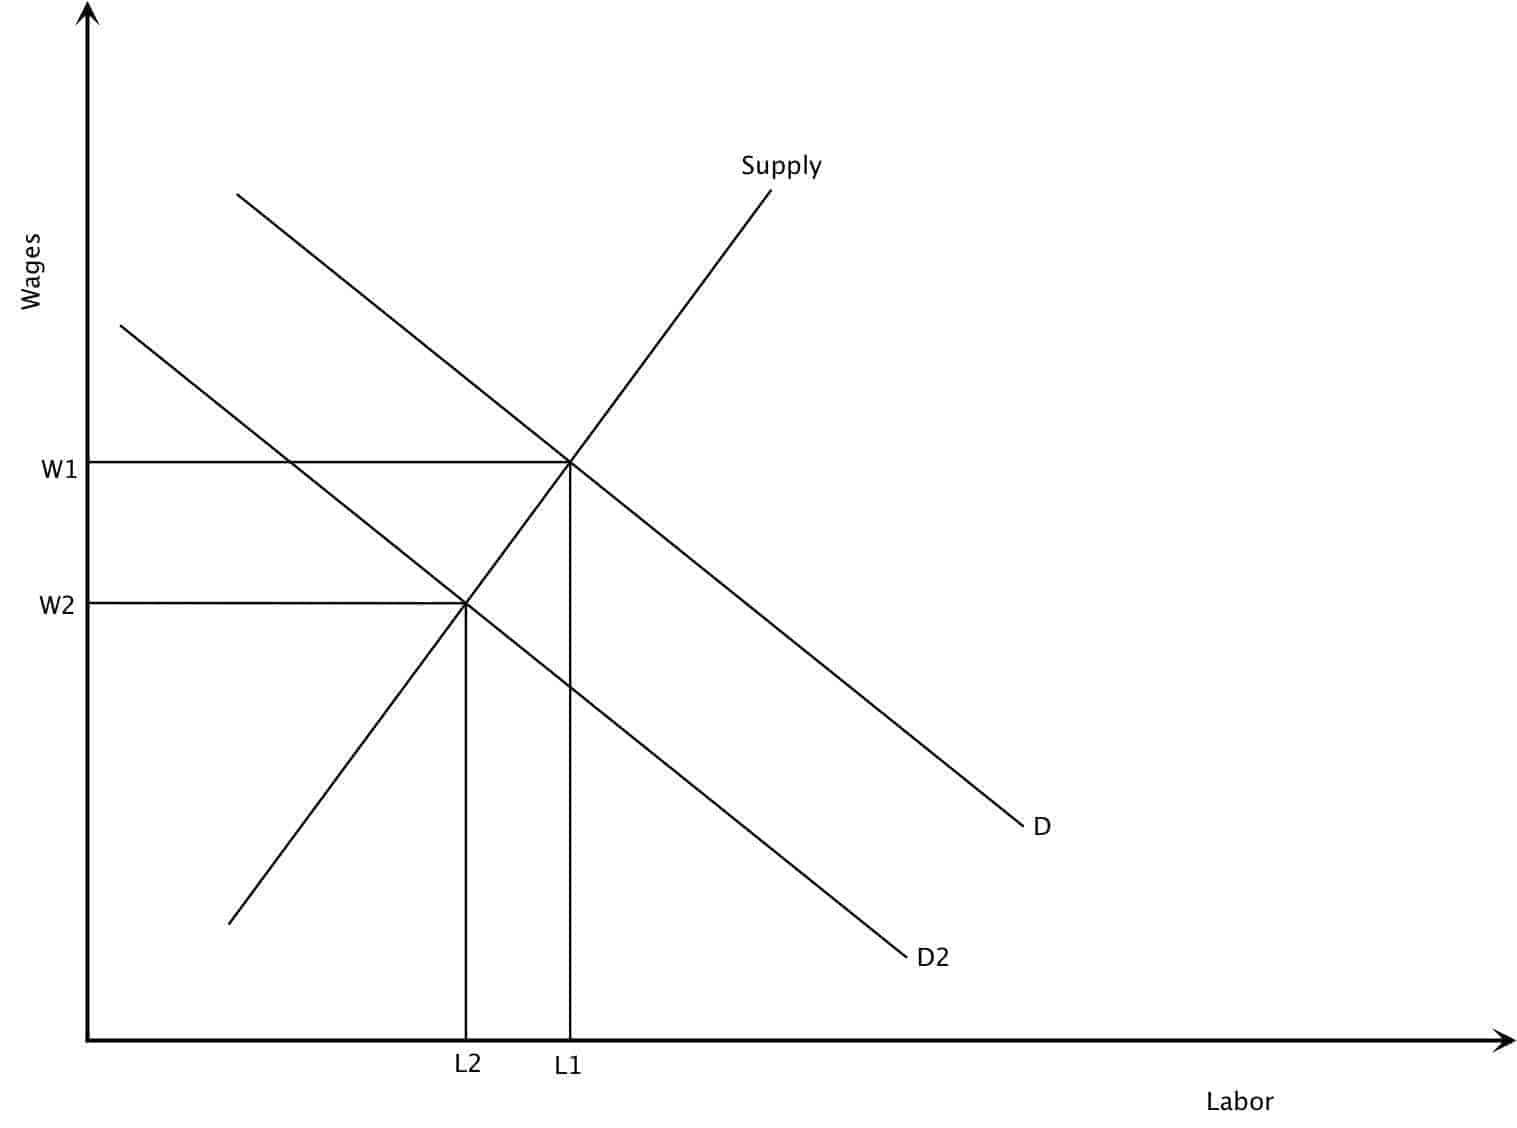 Monetarist Labor Market Graph